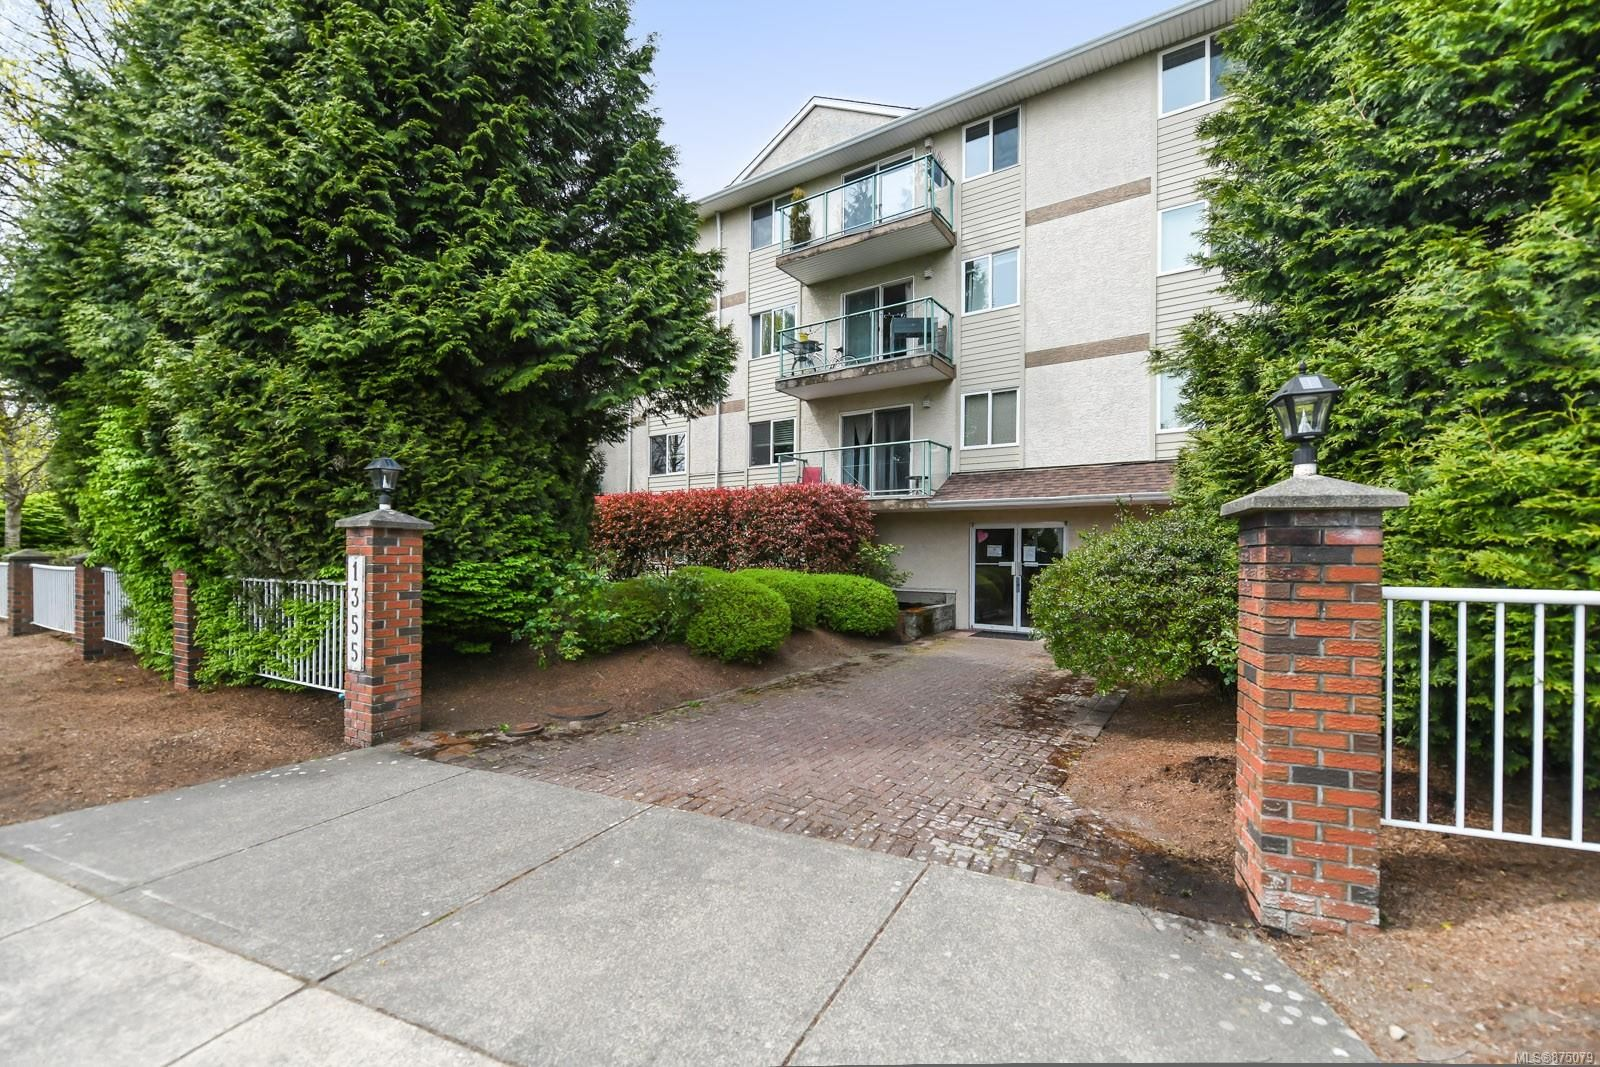 Main Photo: 205 1355 Cumberland Rd in : CV Courtenay City Condo for sale (Comox Valley)  : MLS®# 875079